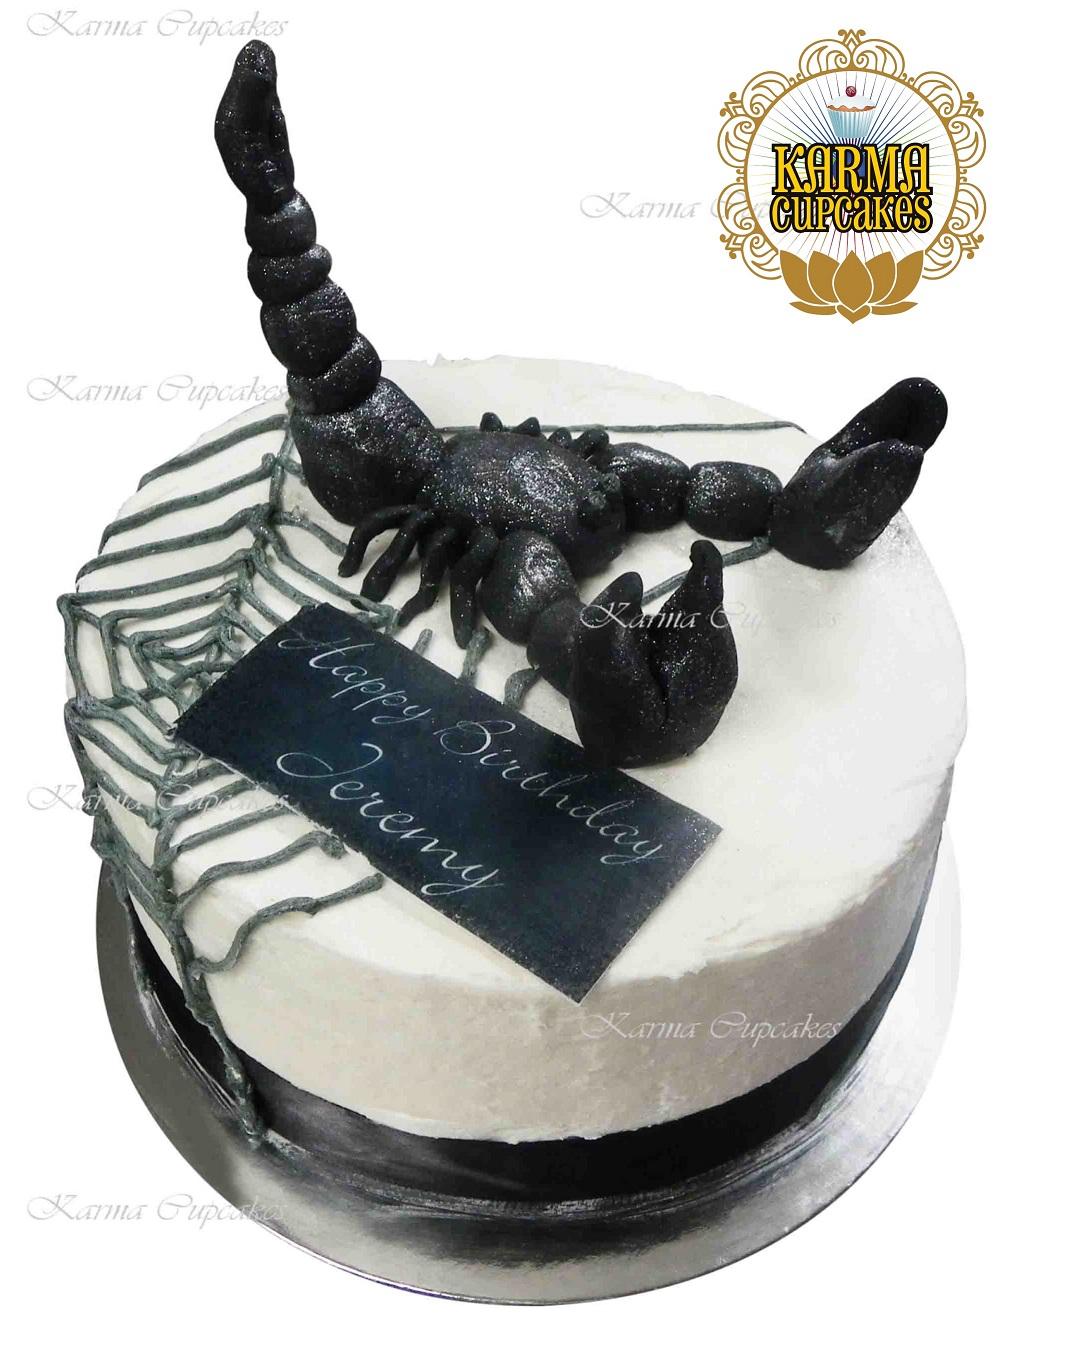 Scorpion Cake